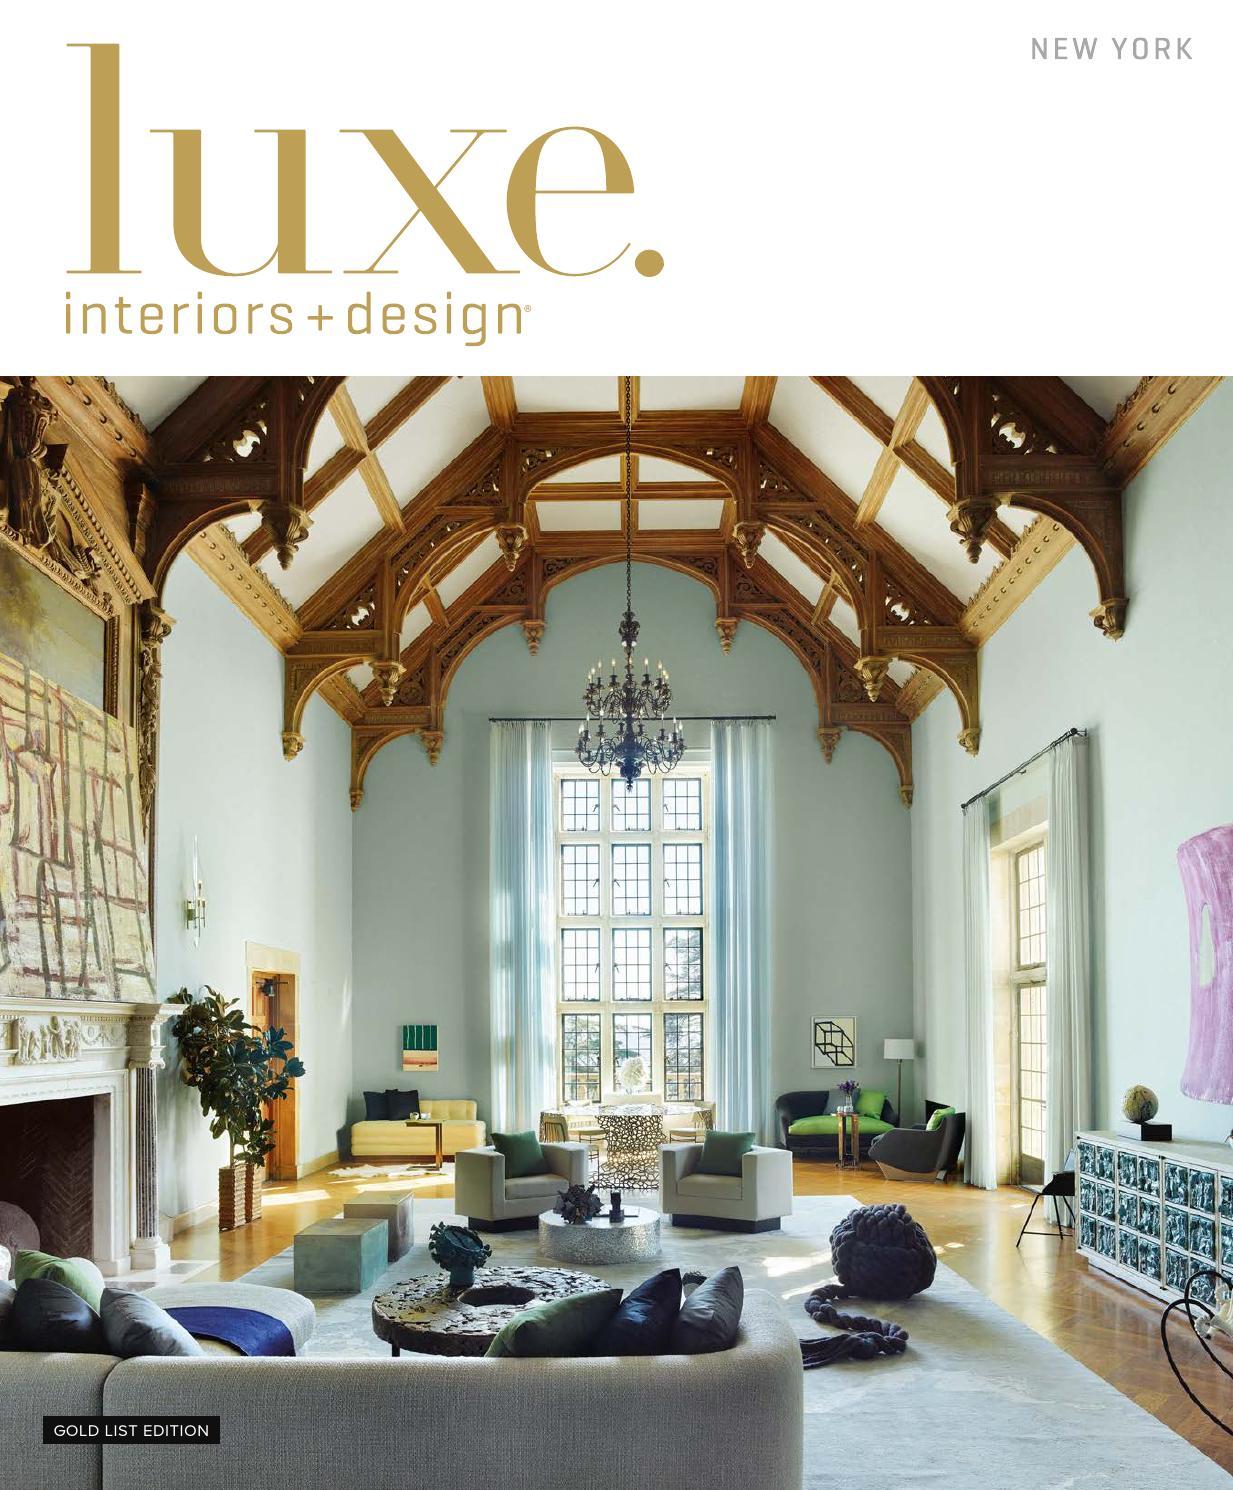 e25fde4bf0 Luxe Magazine January 2016 New York by SANDOW® - issuu